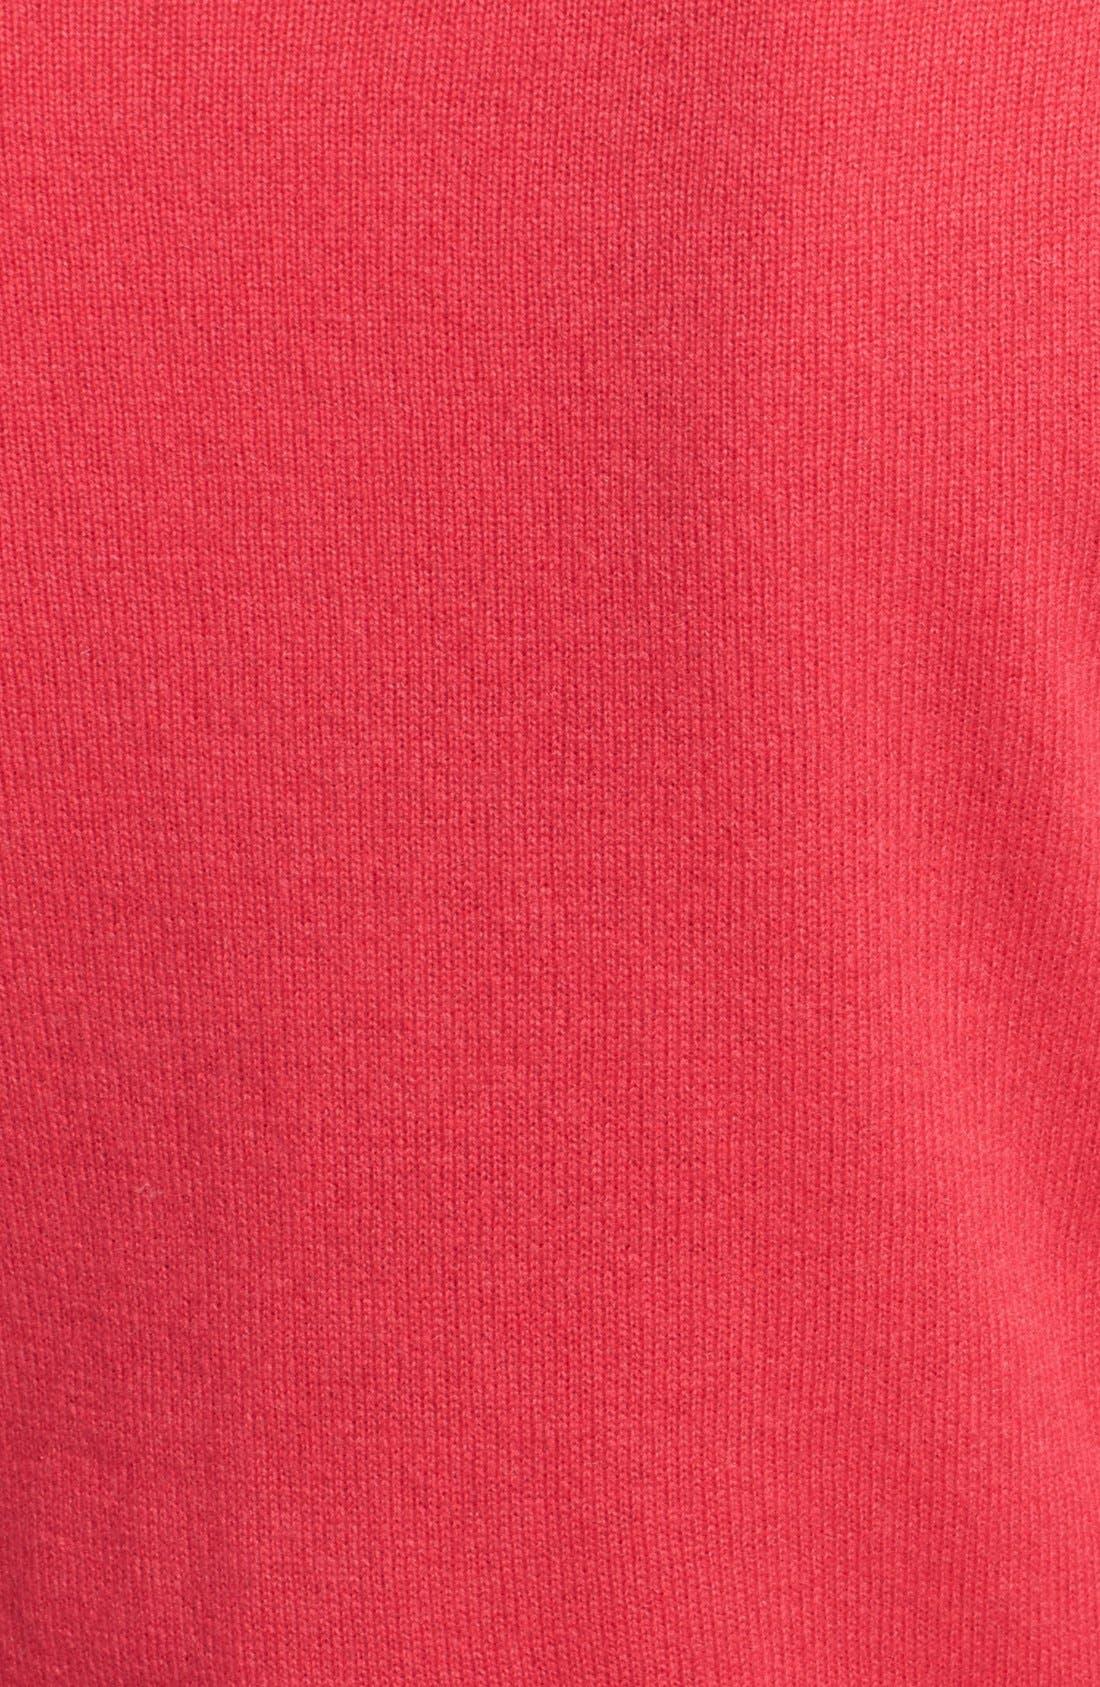 ,                             Cashmere V-Neck Sweater,                             Alternate thumbnail 86, color,                             653